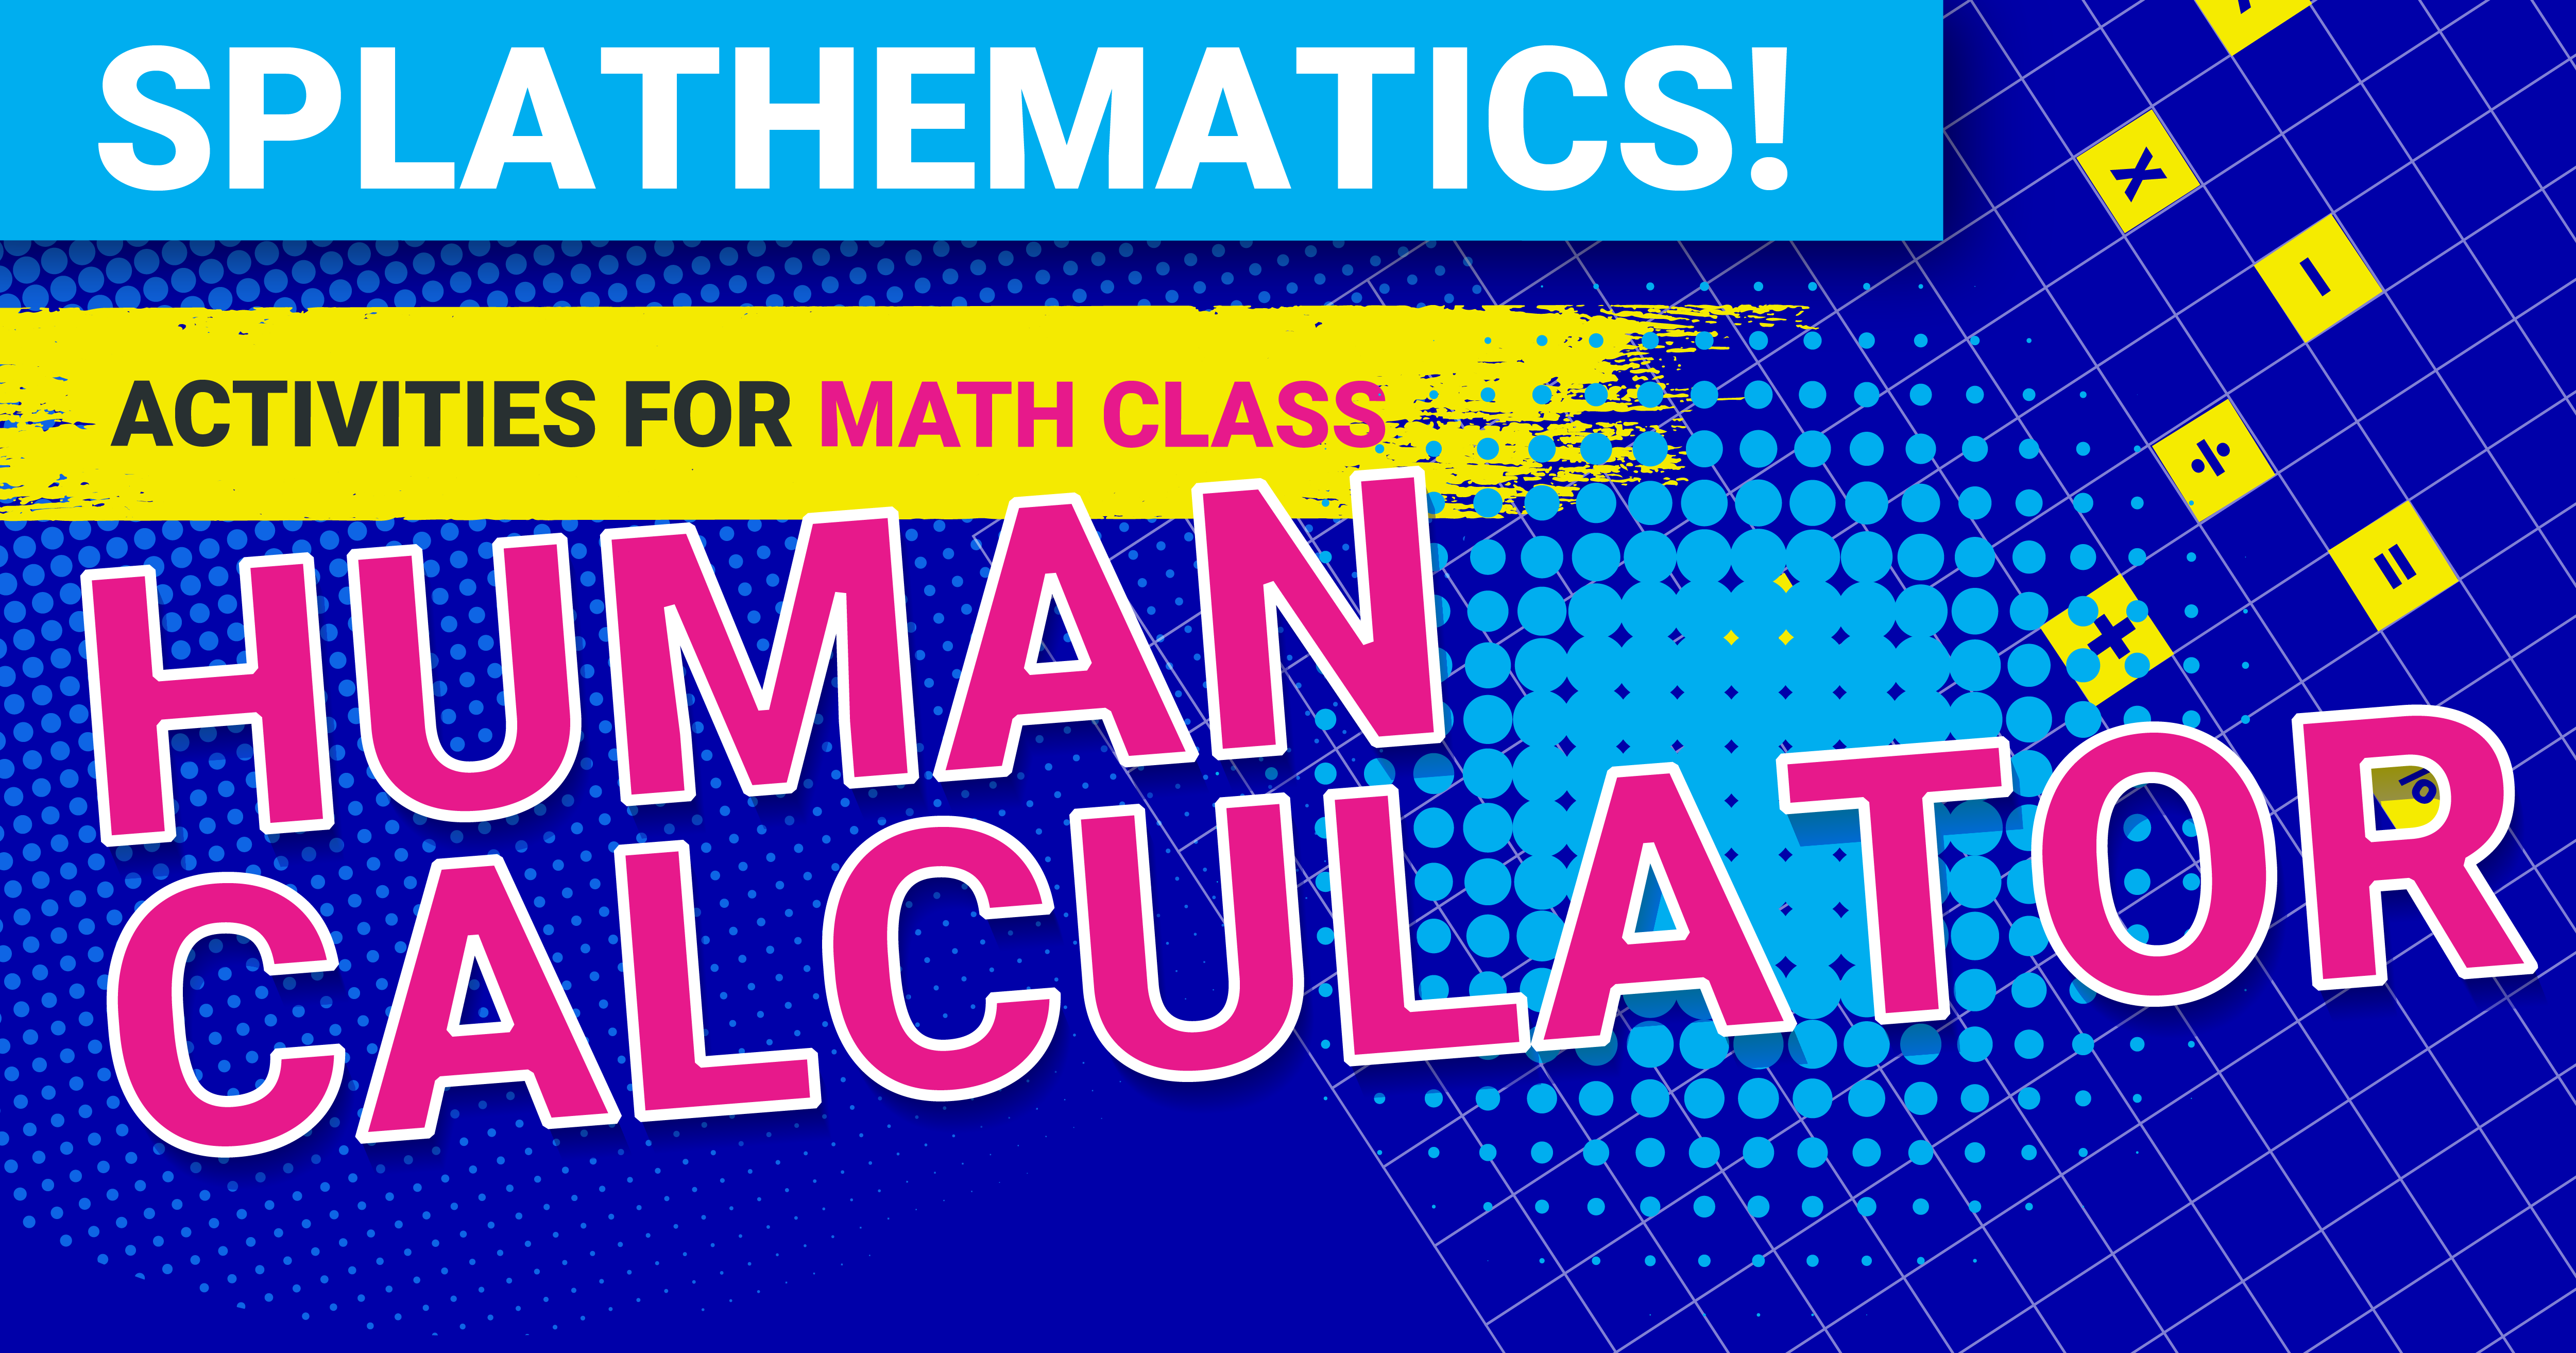 STEM Lesson Plan: Splathematics! Human Calculator